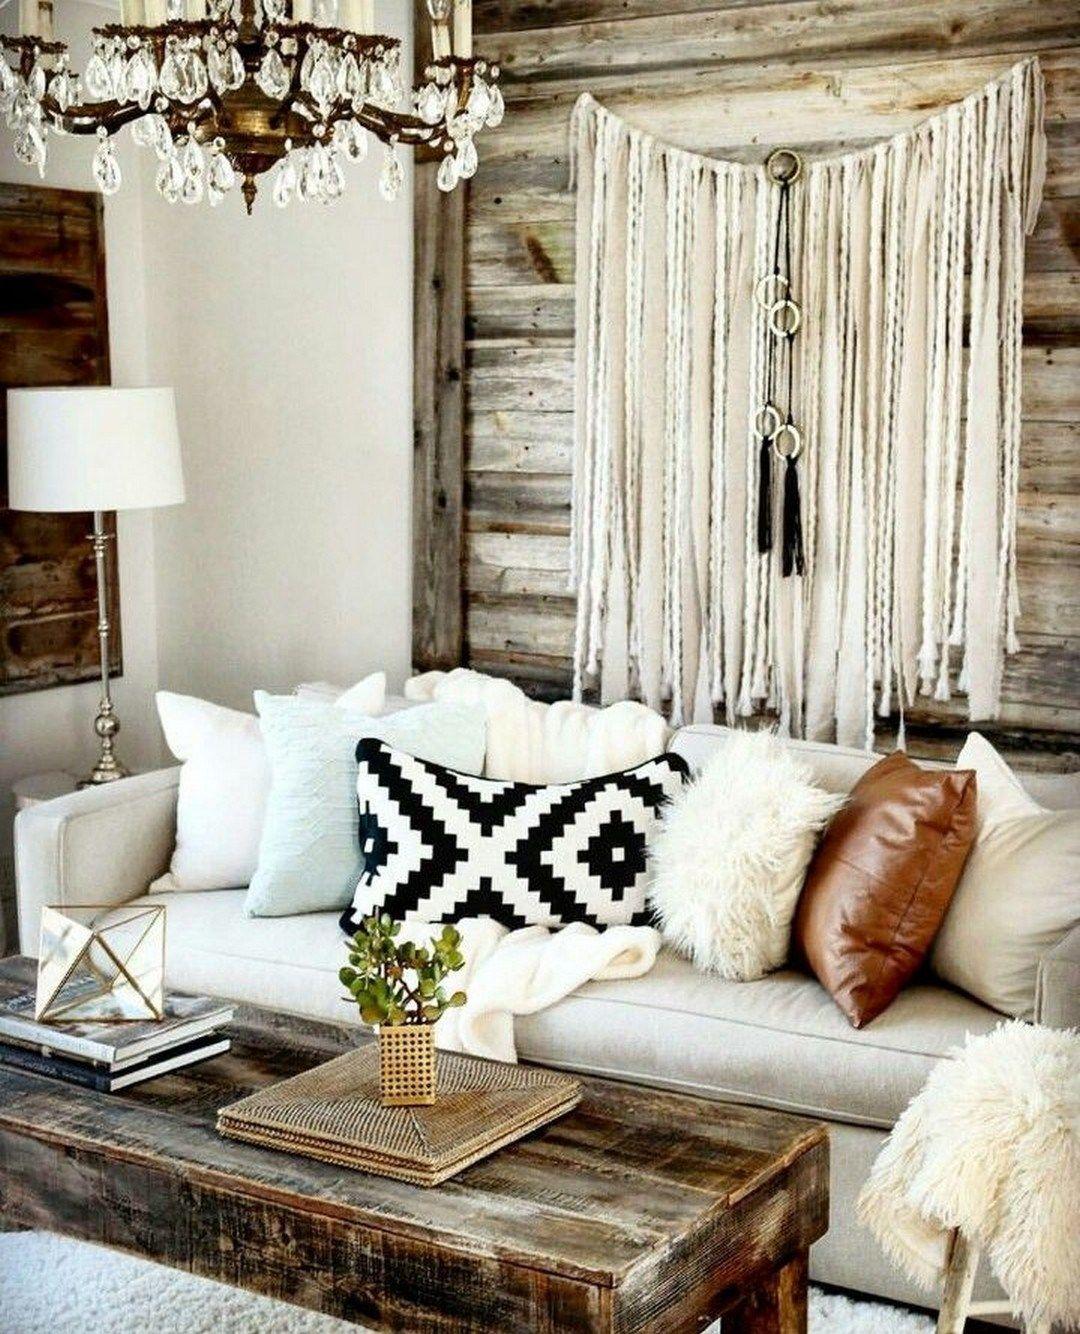 52 rustic farmhouse bohemian decorating ideas home wohnzimmer